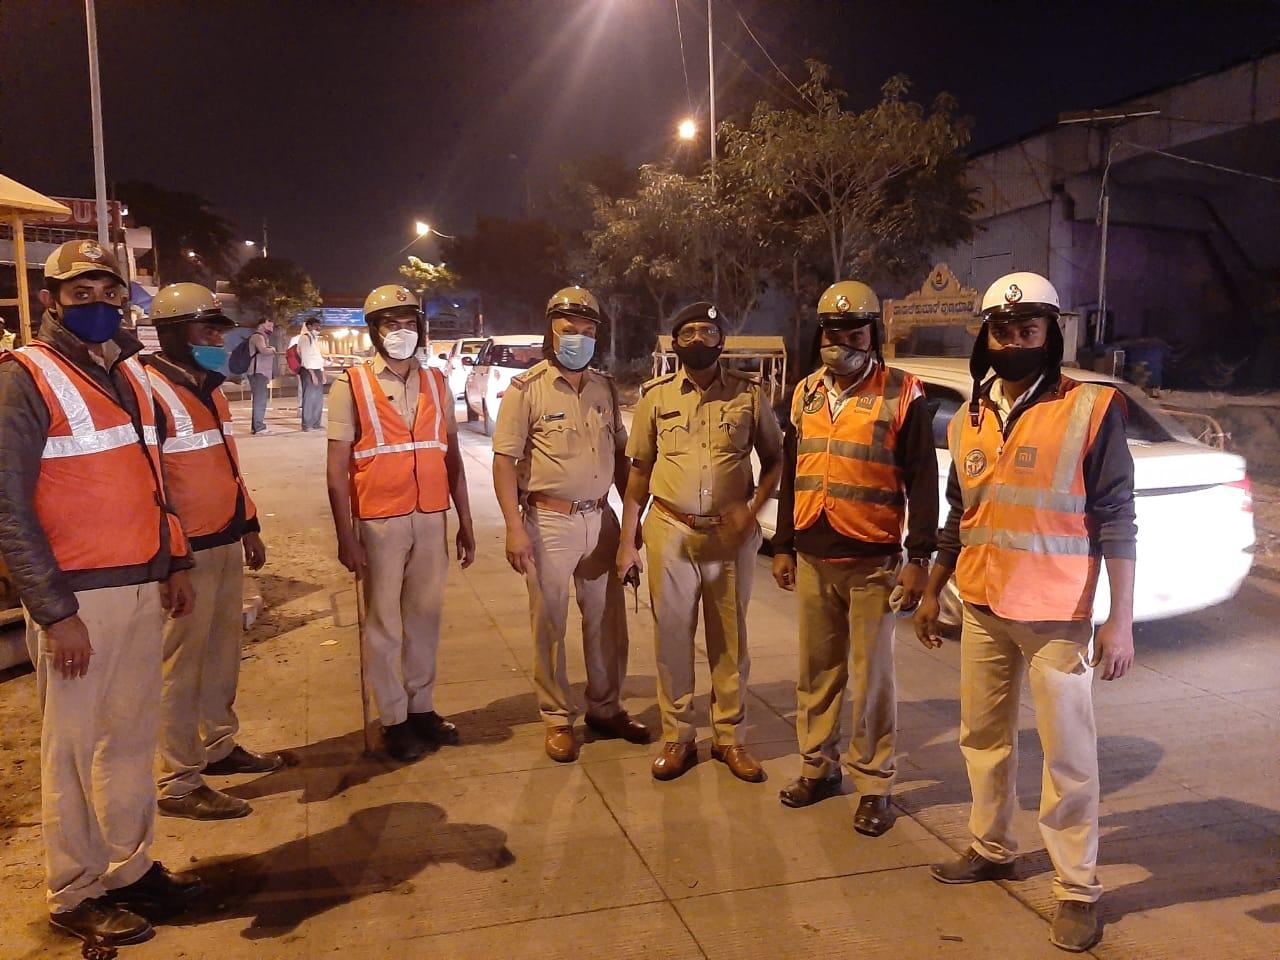 Bengaluru New Year 2021 Celebration And Preparation Photos